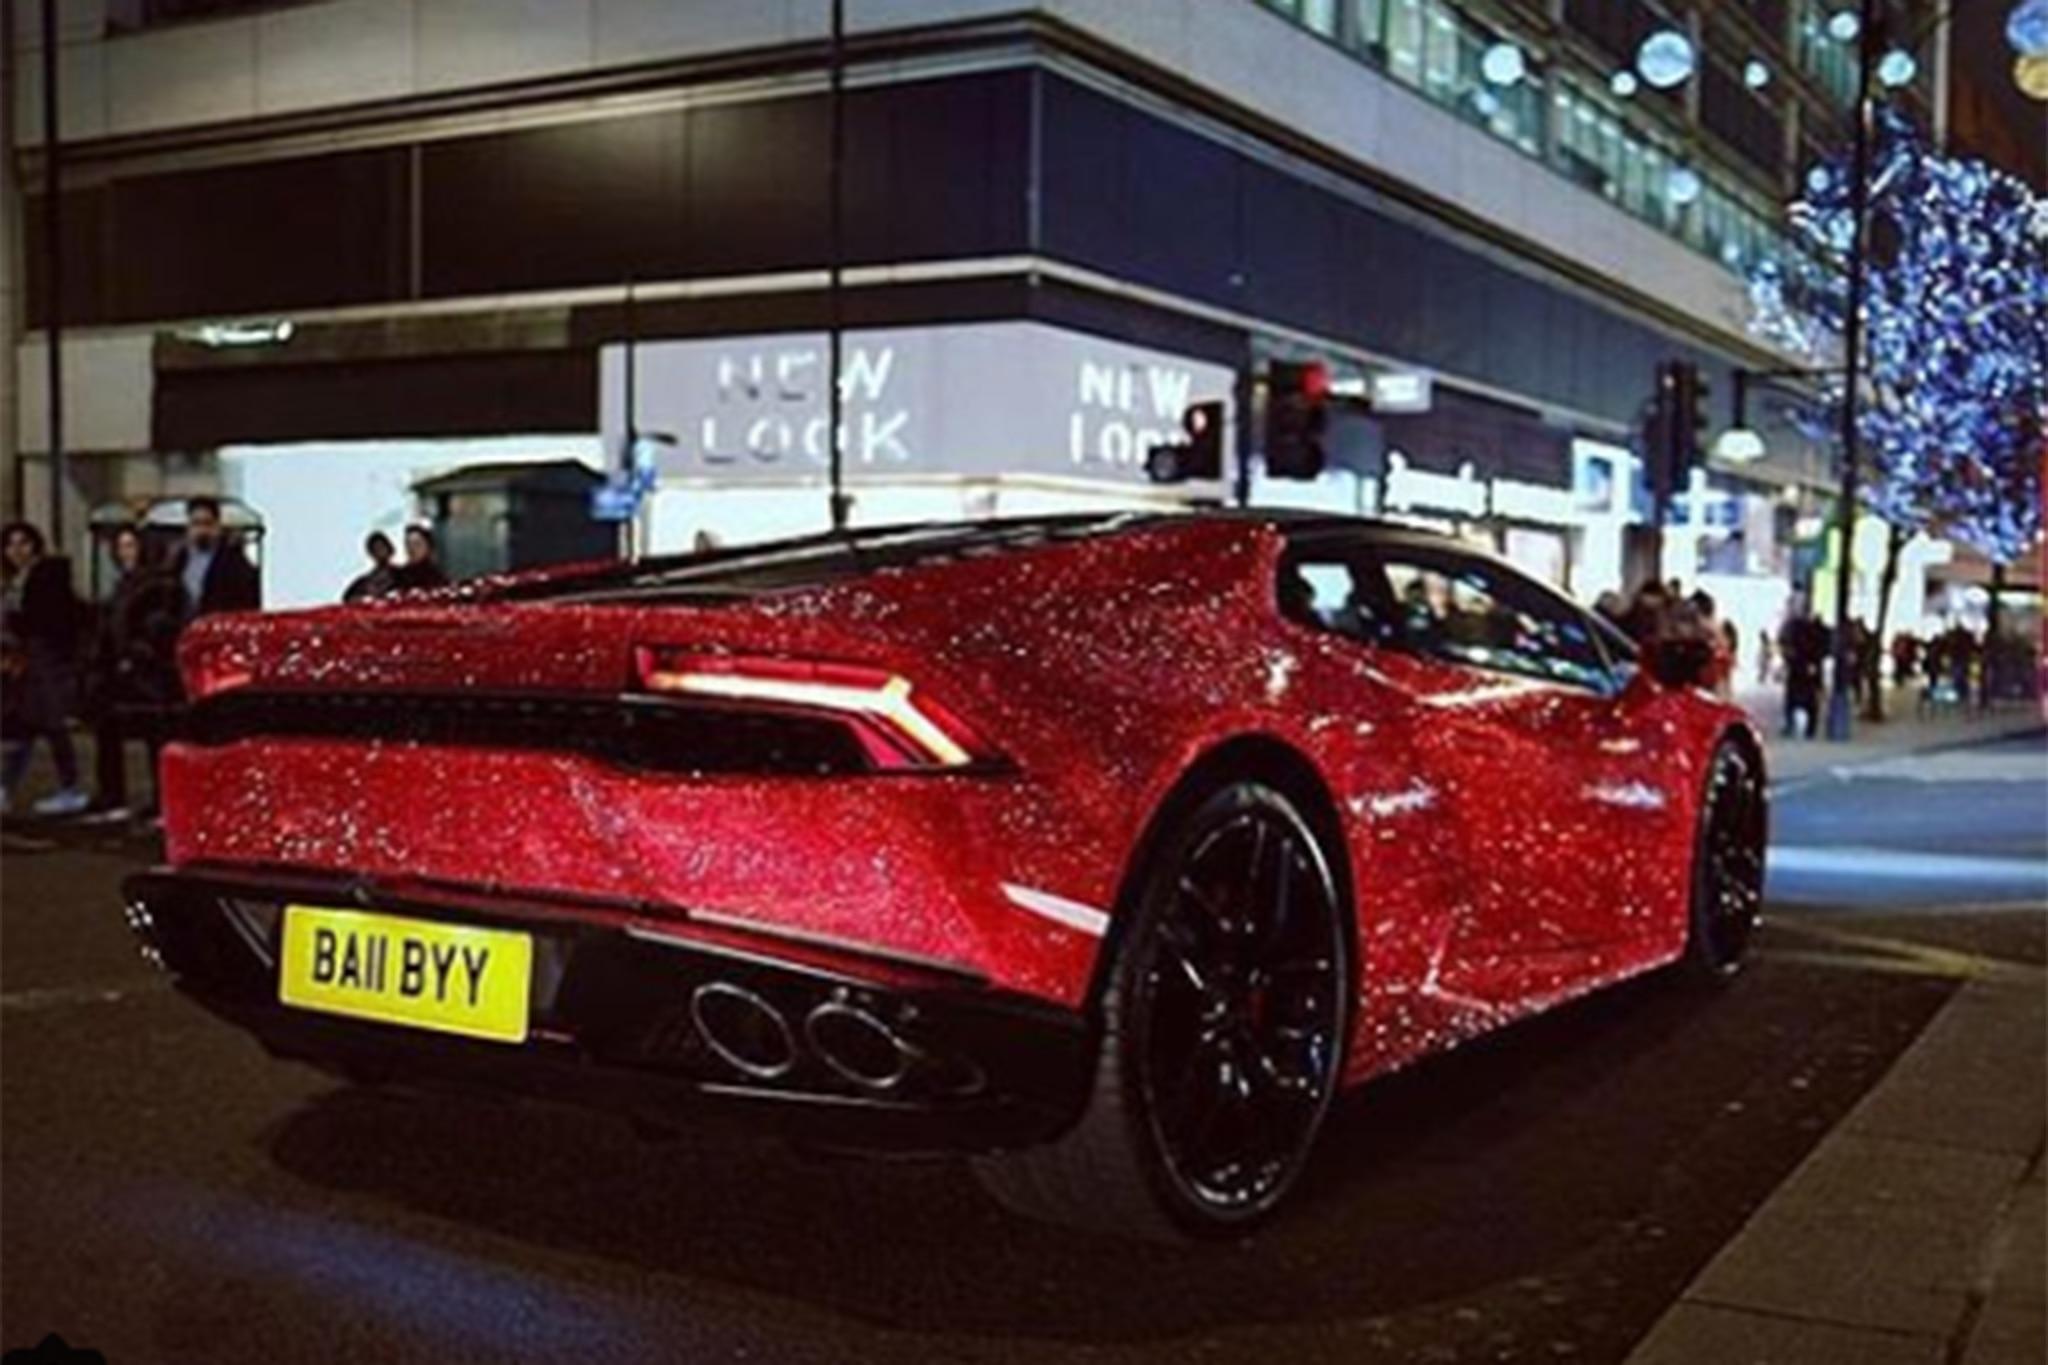 Superb Daria Radionova Lamborghini Huracan Via Instagram